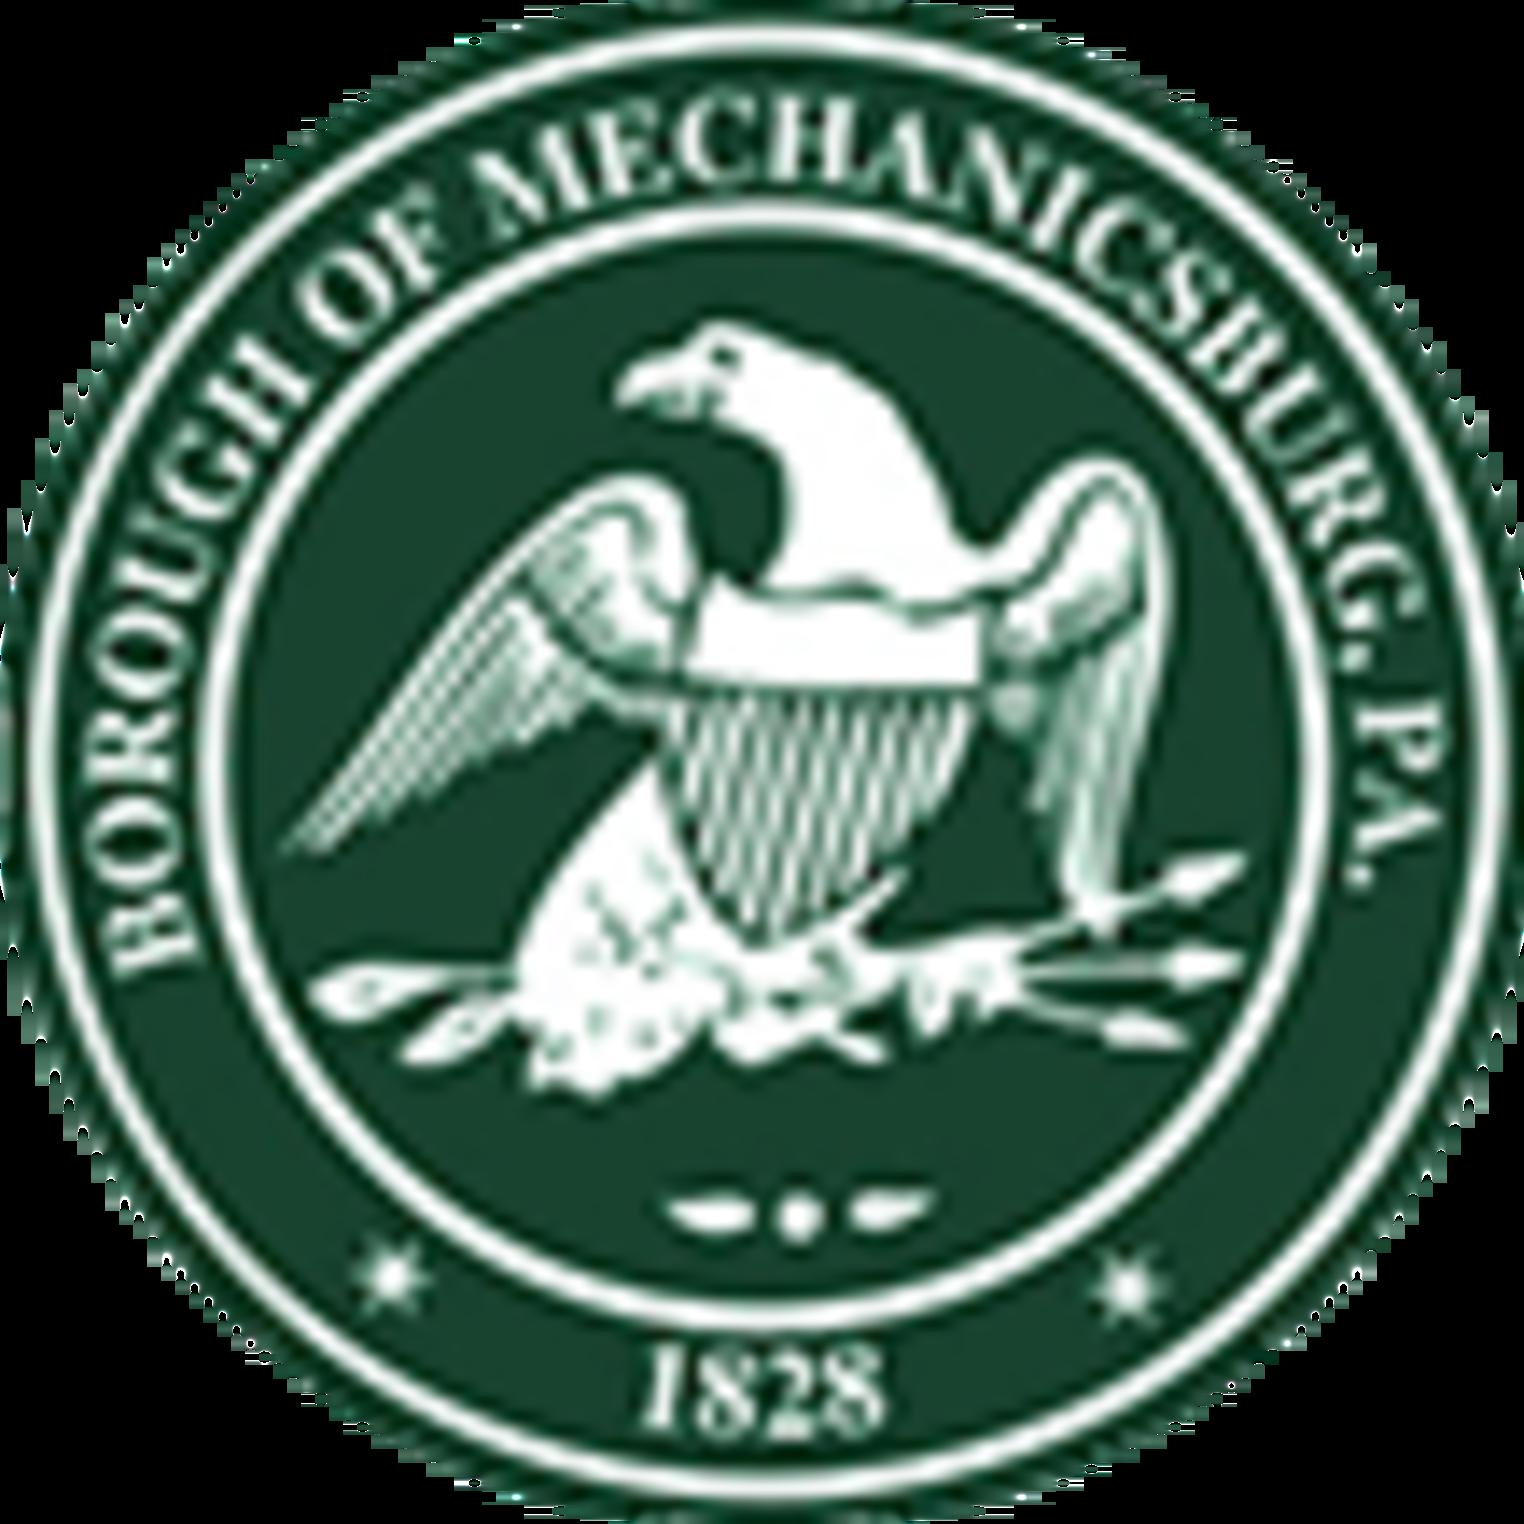 Mechanicsburg Borough